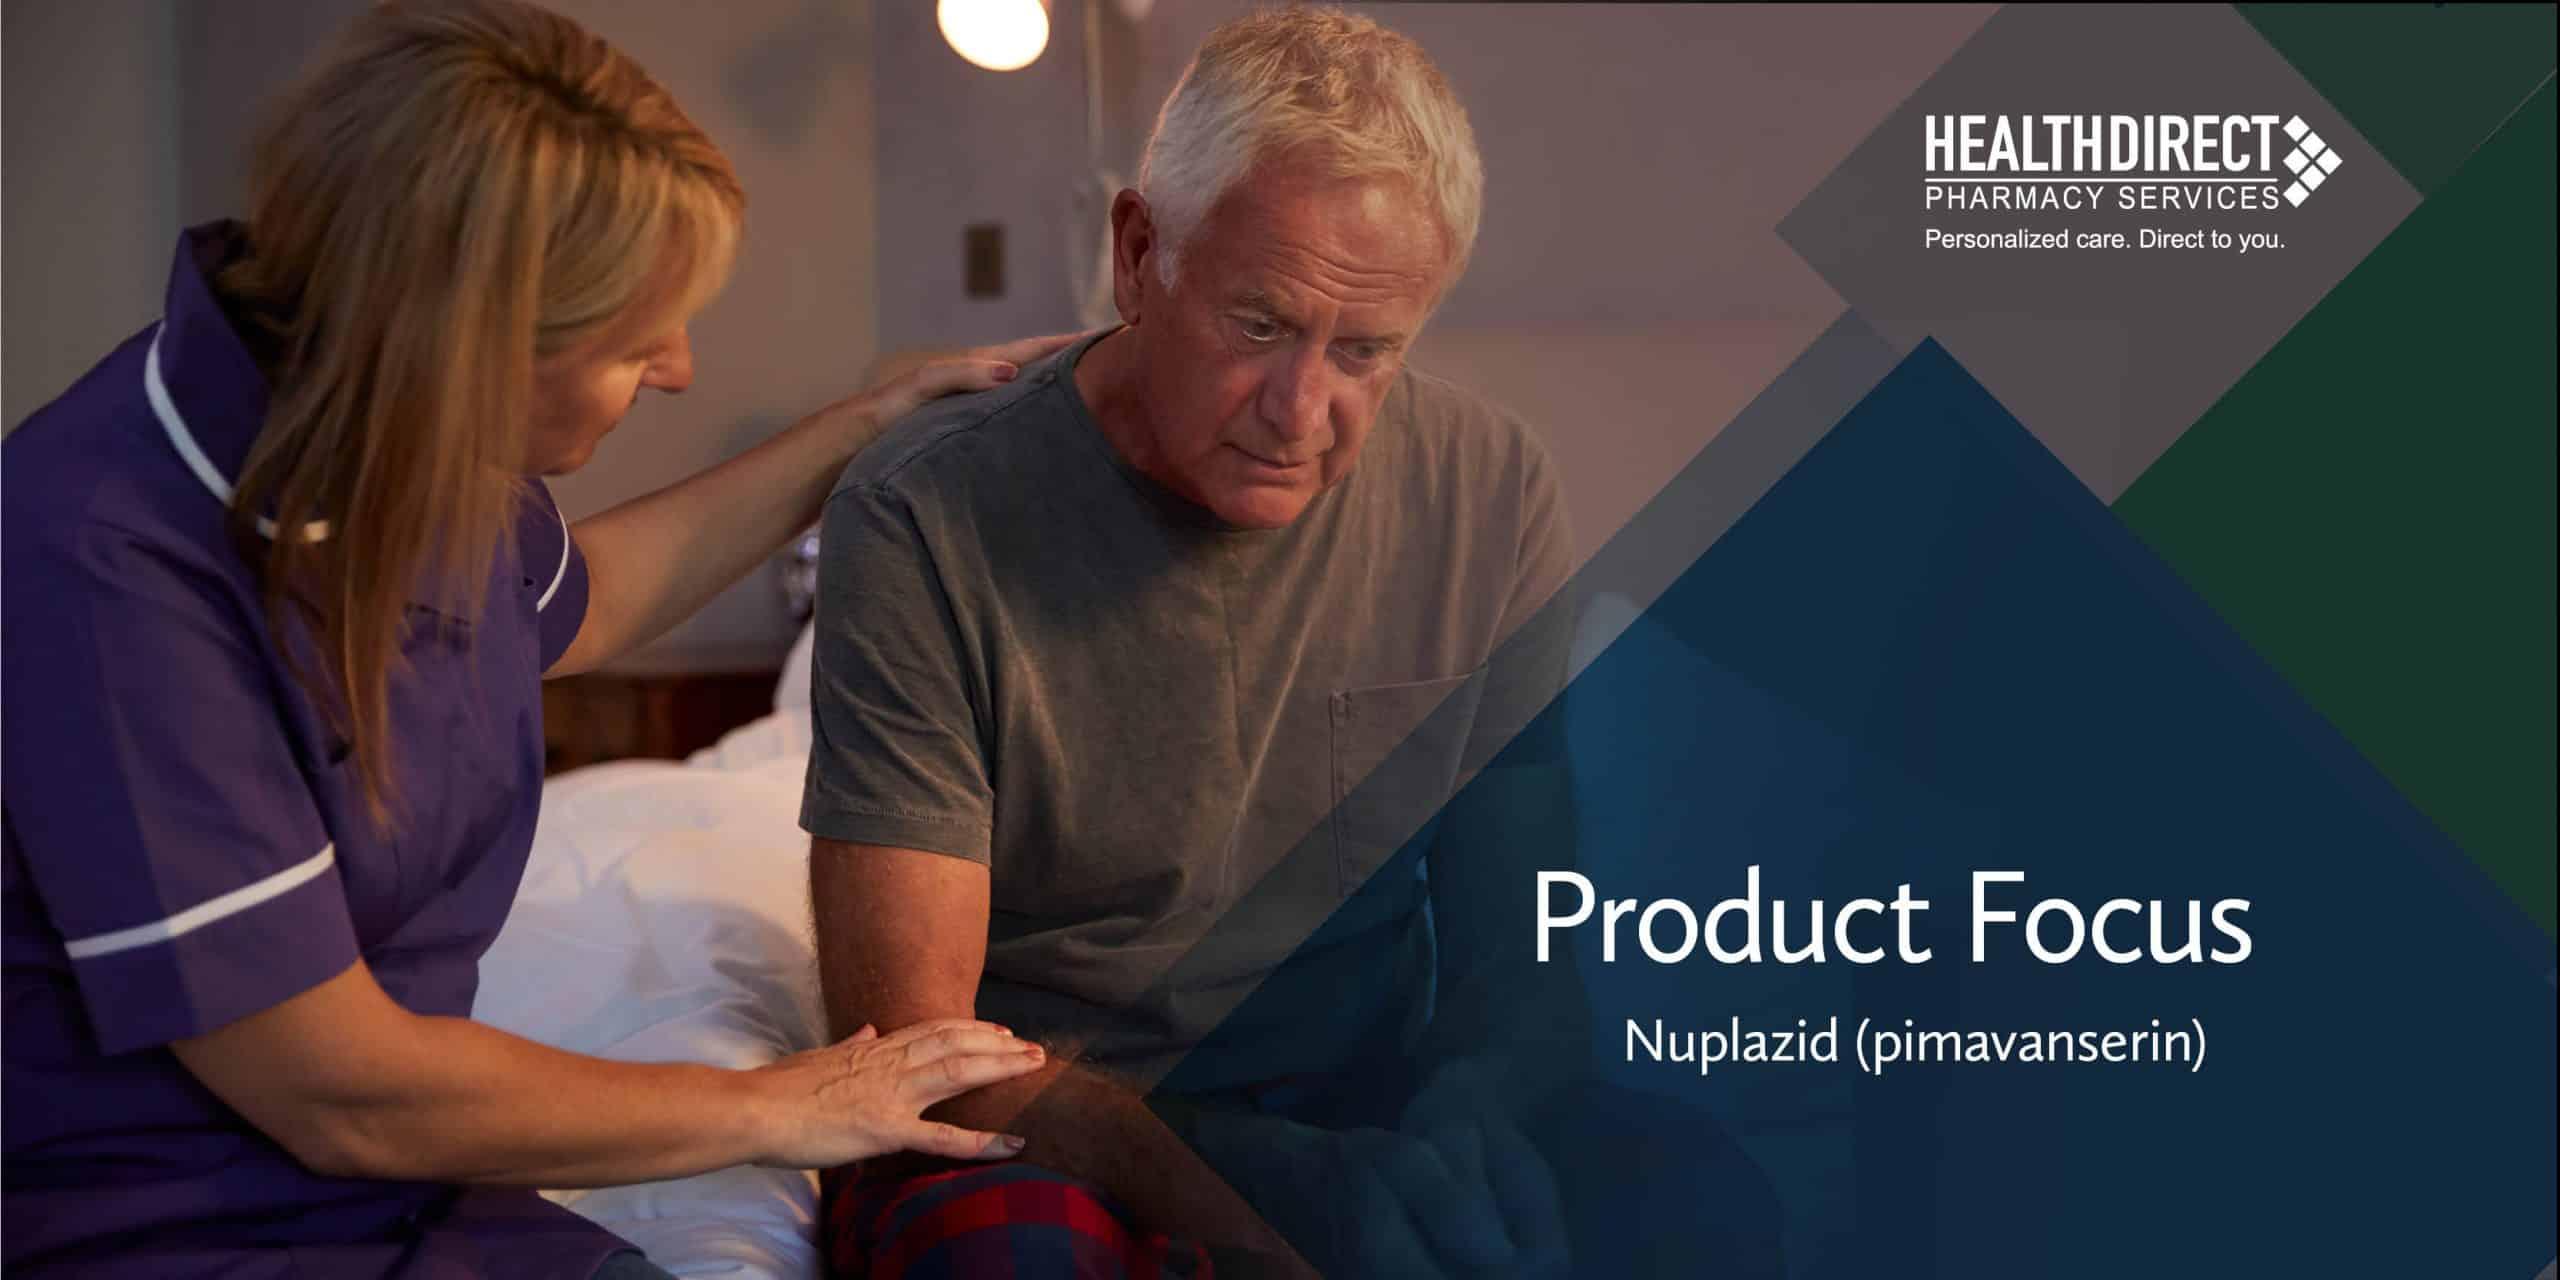 Product Focus – Nuplazid (pimavanserin)